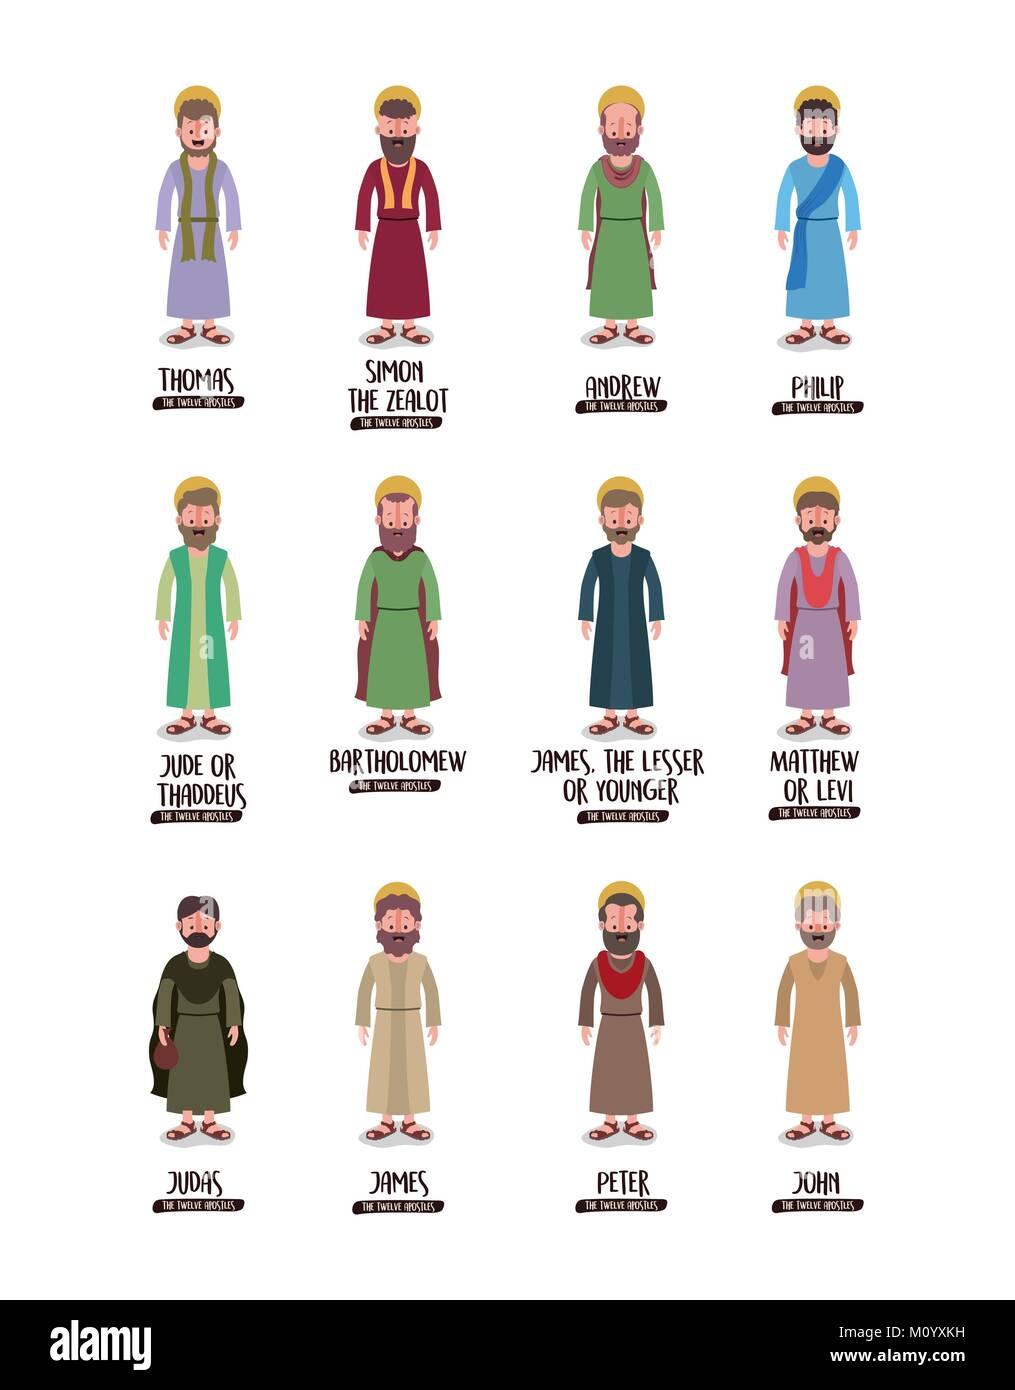 The 12 Best Fall 2016 Trends From New York Fashion Week: Twelve Apostles Jesus Stock Photos & Twelve Apostles Jesus